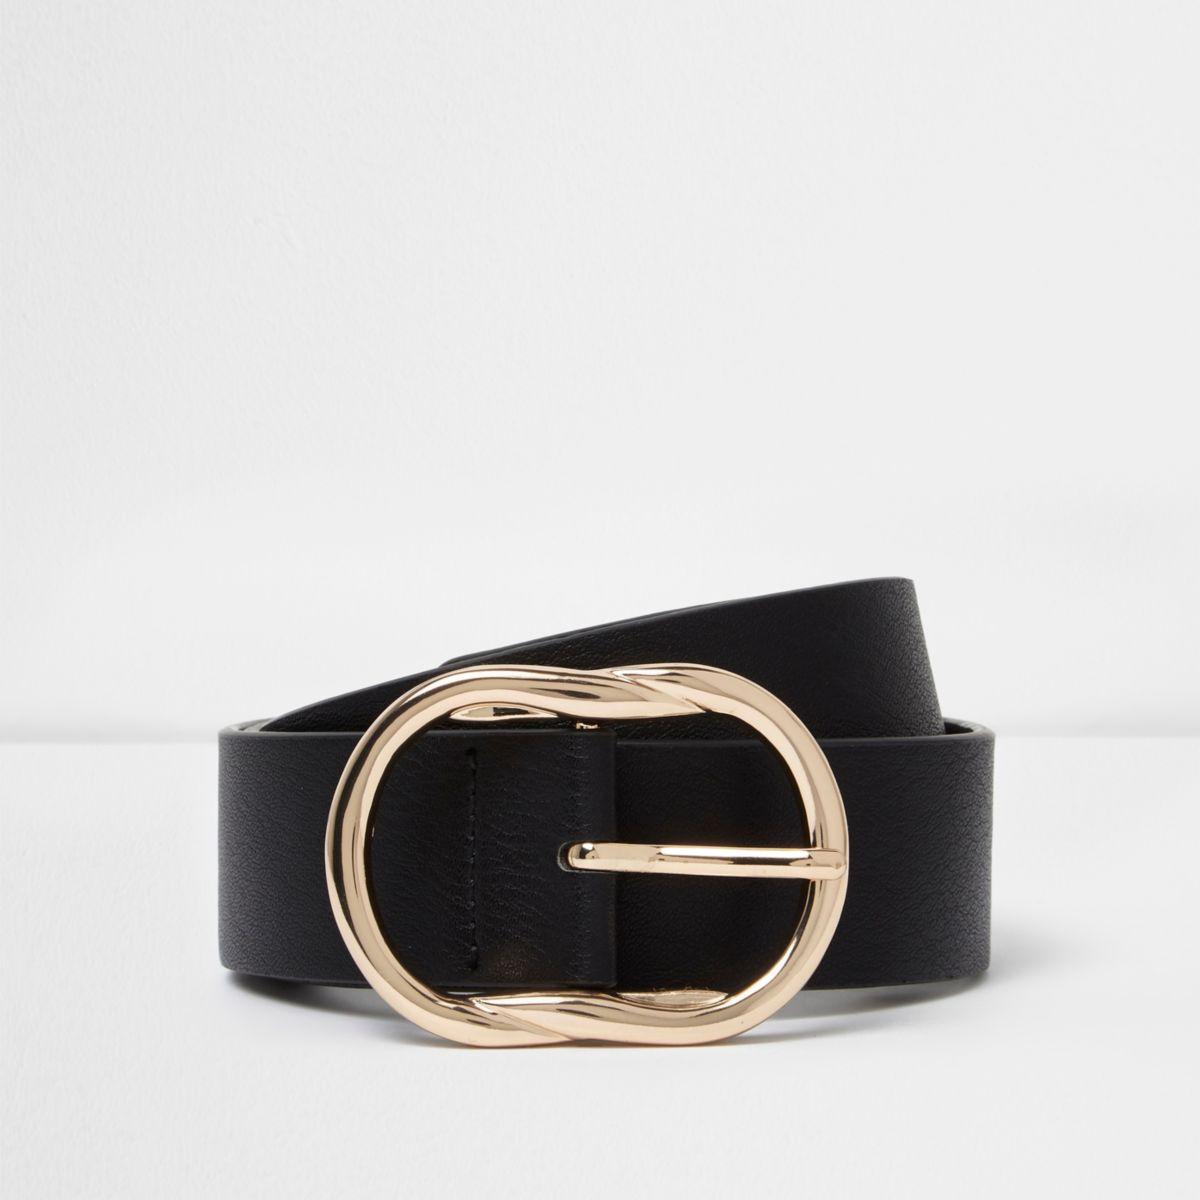 Zwarte jeansriem met ovalen gesp